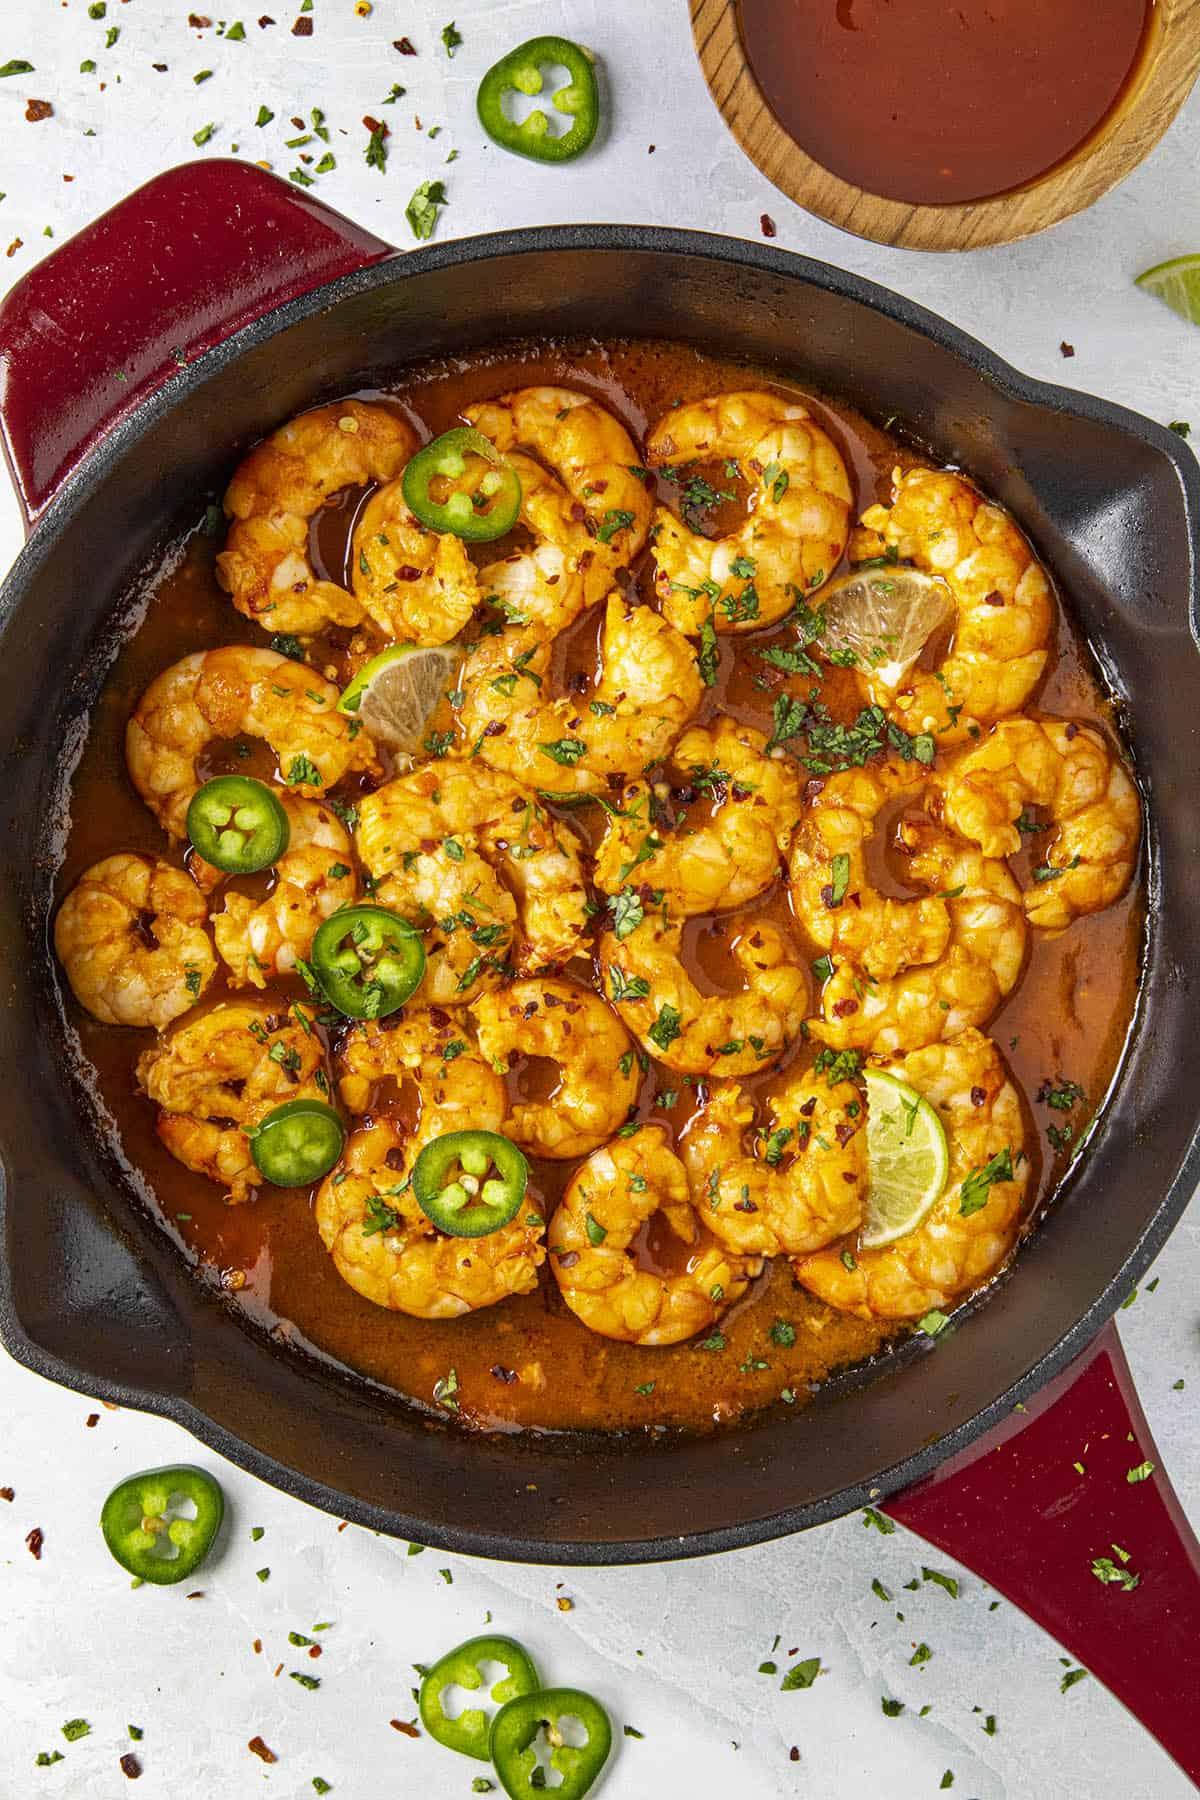 Firecracker Shrimp being served